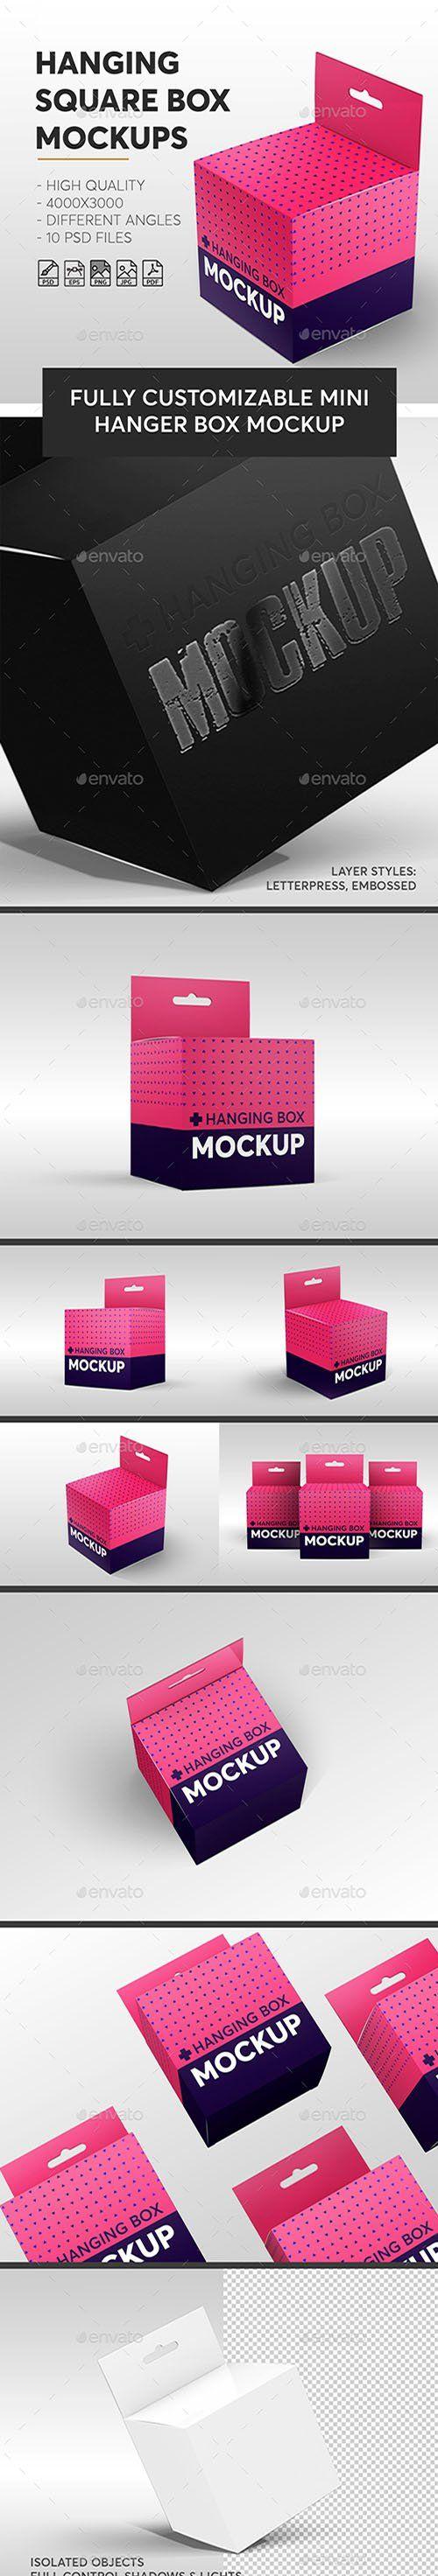 Download Gr Hanging Square Box Mockups V 1 Miscellaneous 23078385 Box Mockup Flyer Mockup Mockup